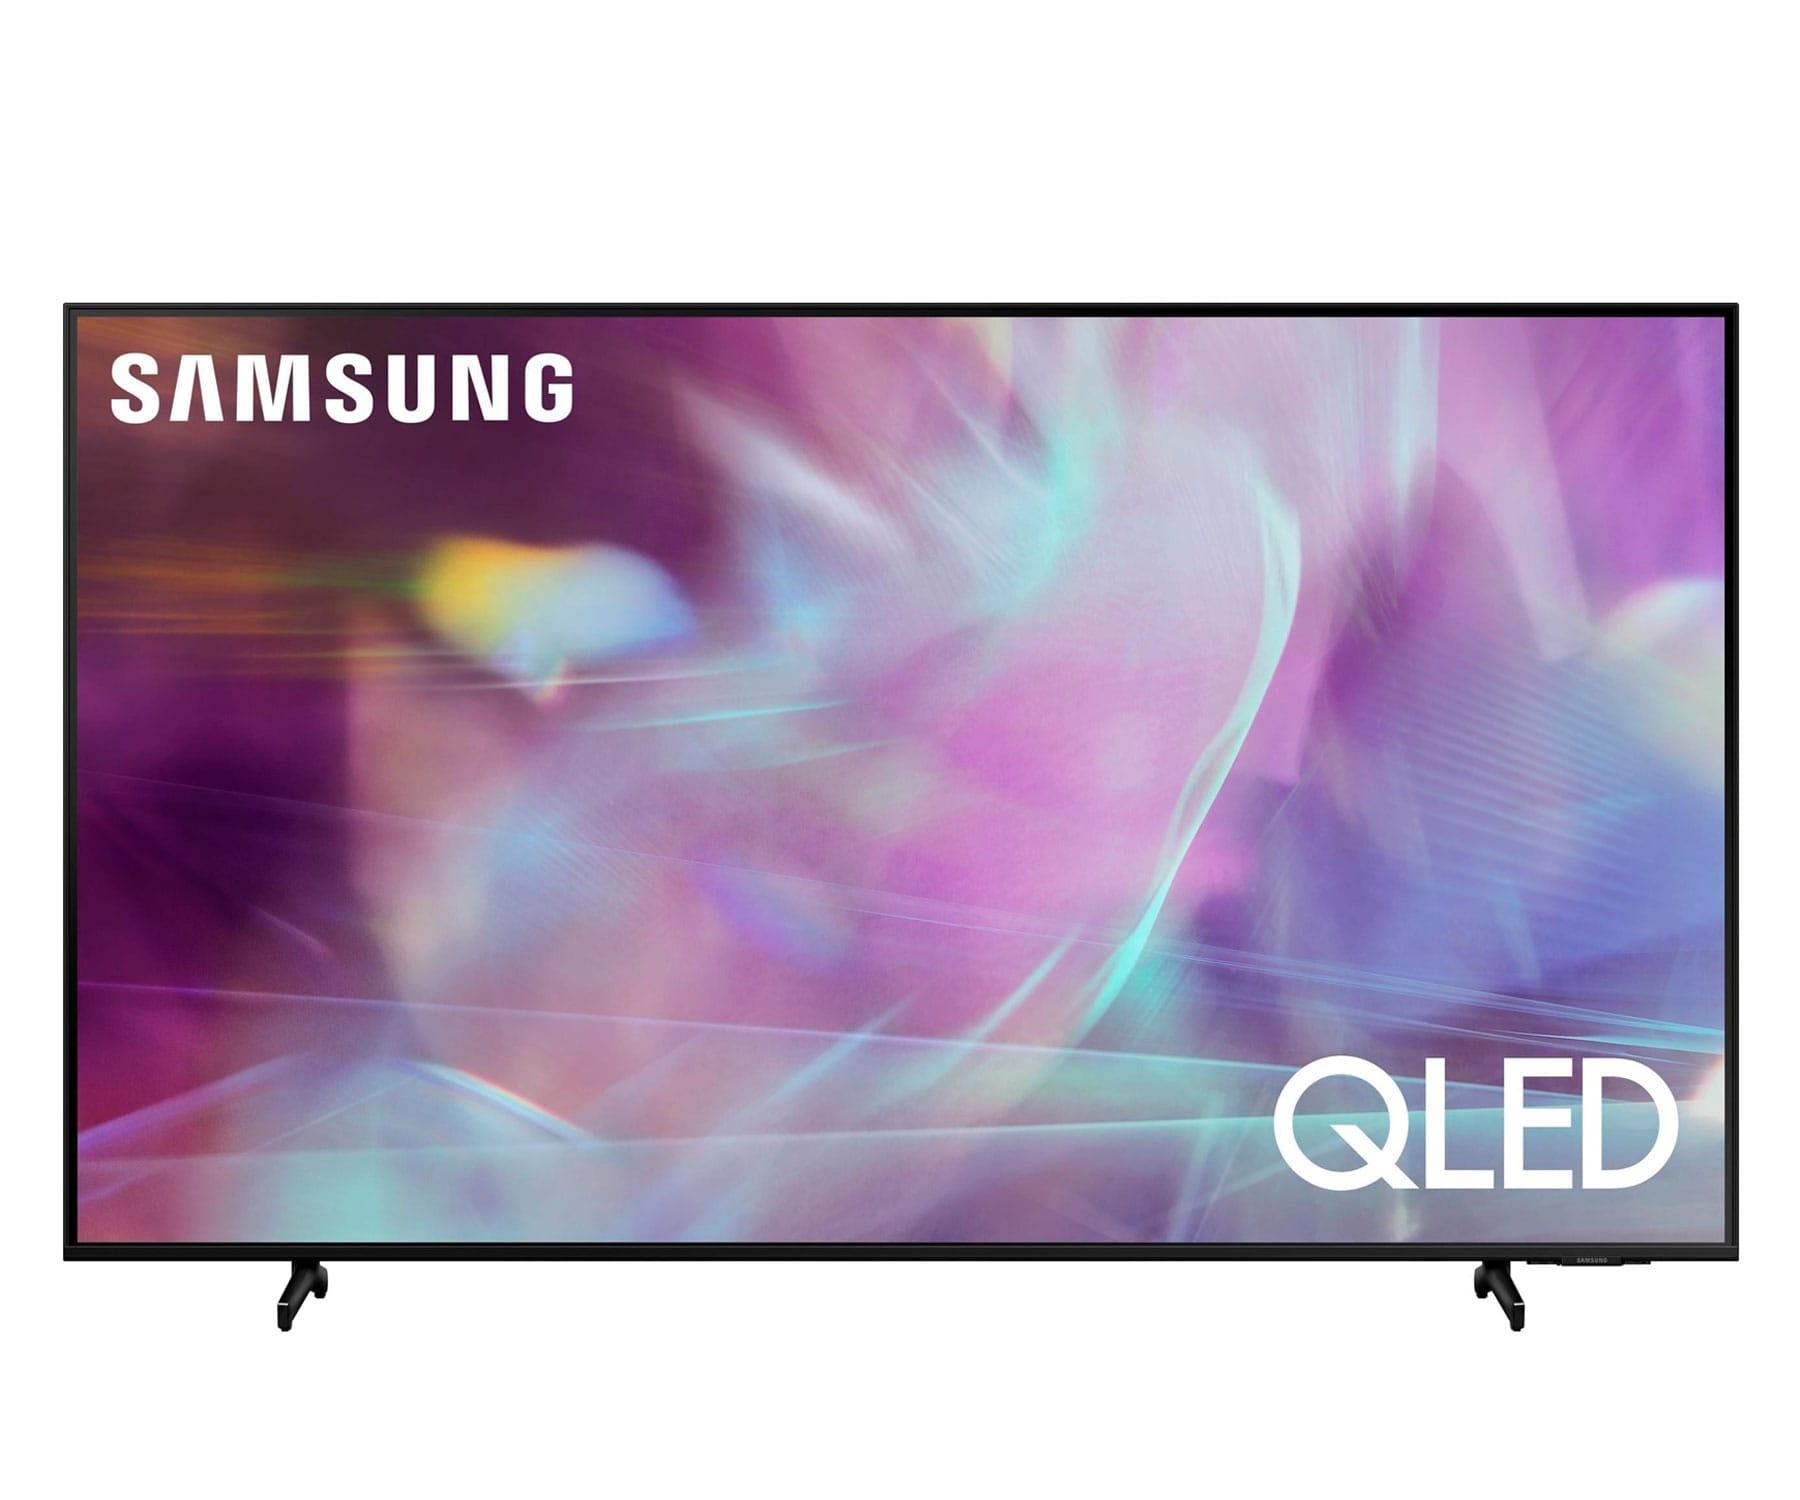 SAMSUNG QE55Q60AAUXXC NEGRO TELEVISOR 55'' QLED 4K SMART TV WIFI BLUETOOTH AMBIENT MODE